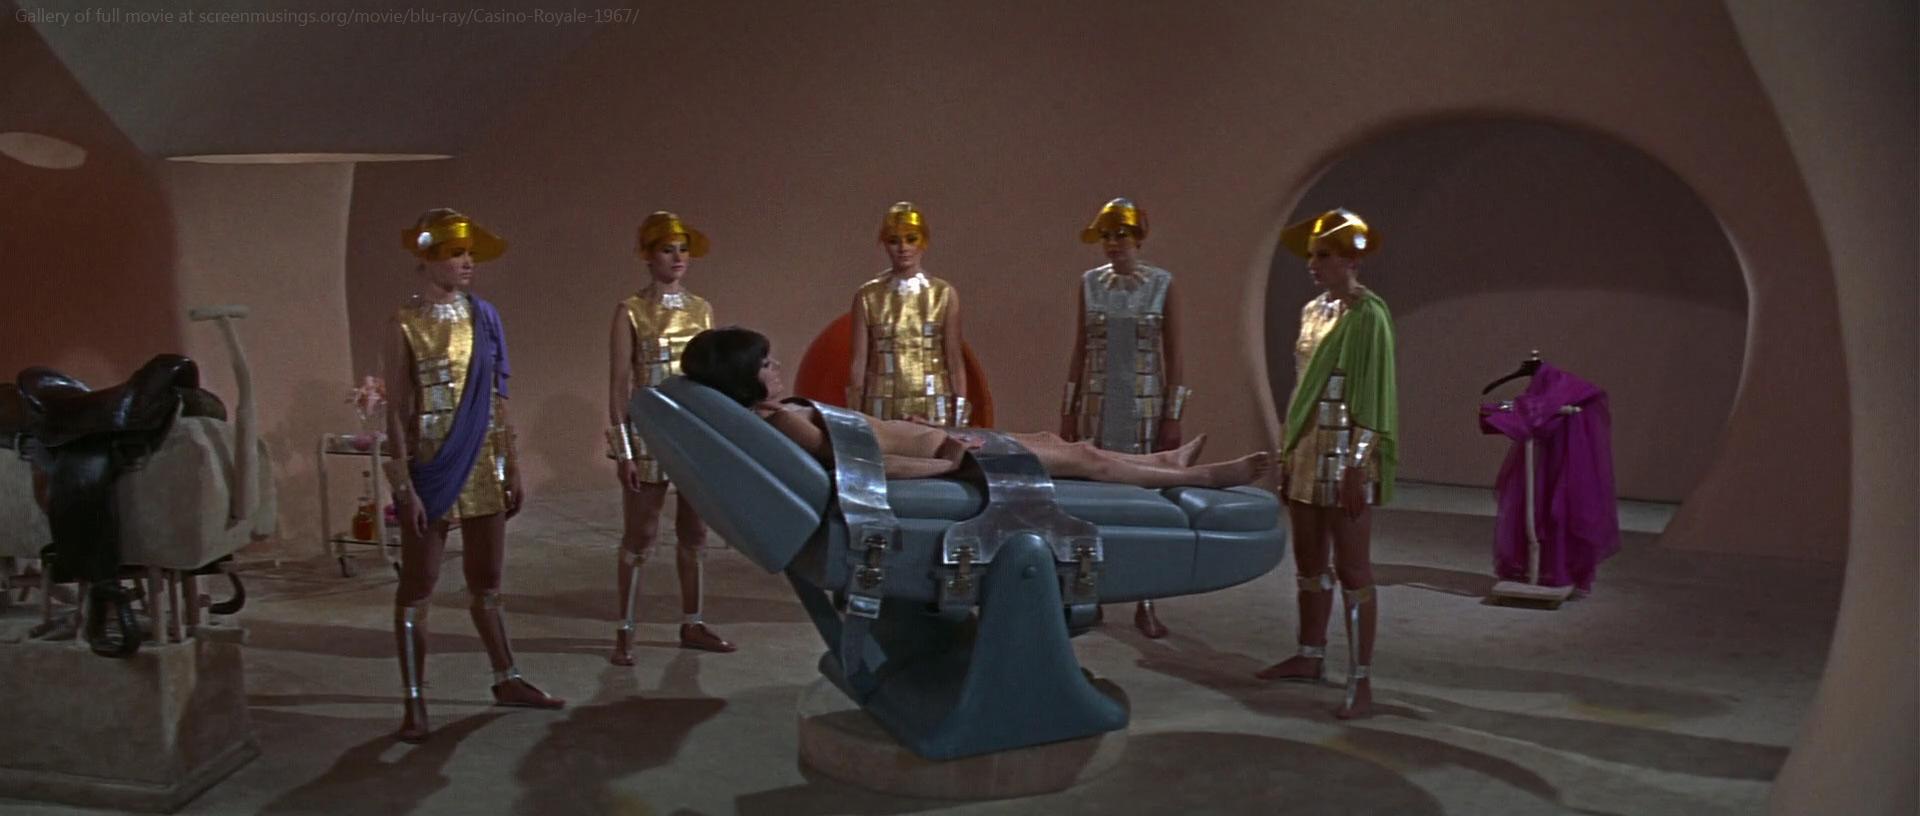 Casino royale 1967 cast